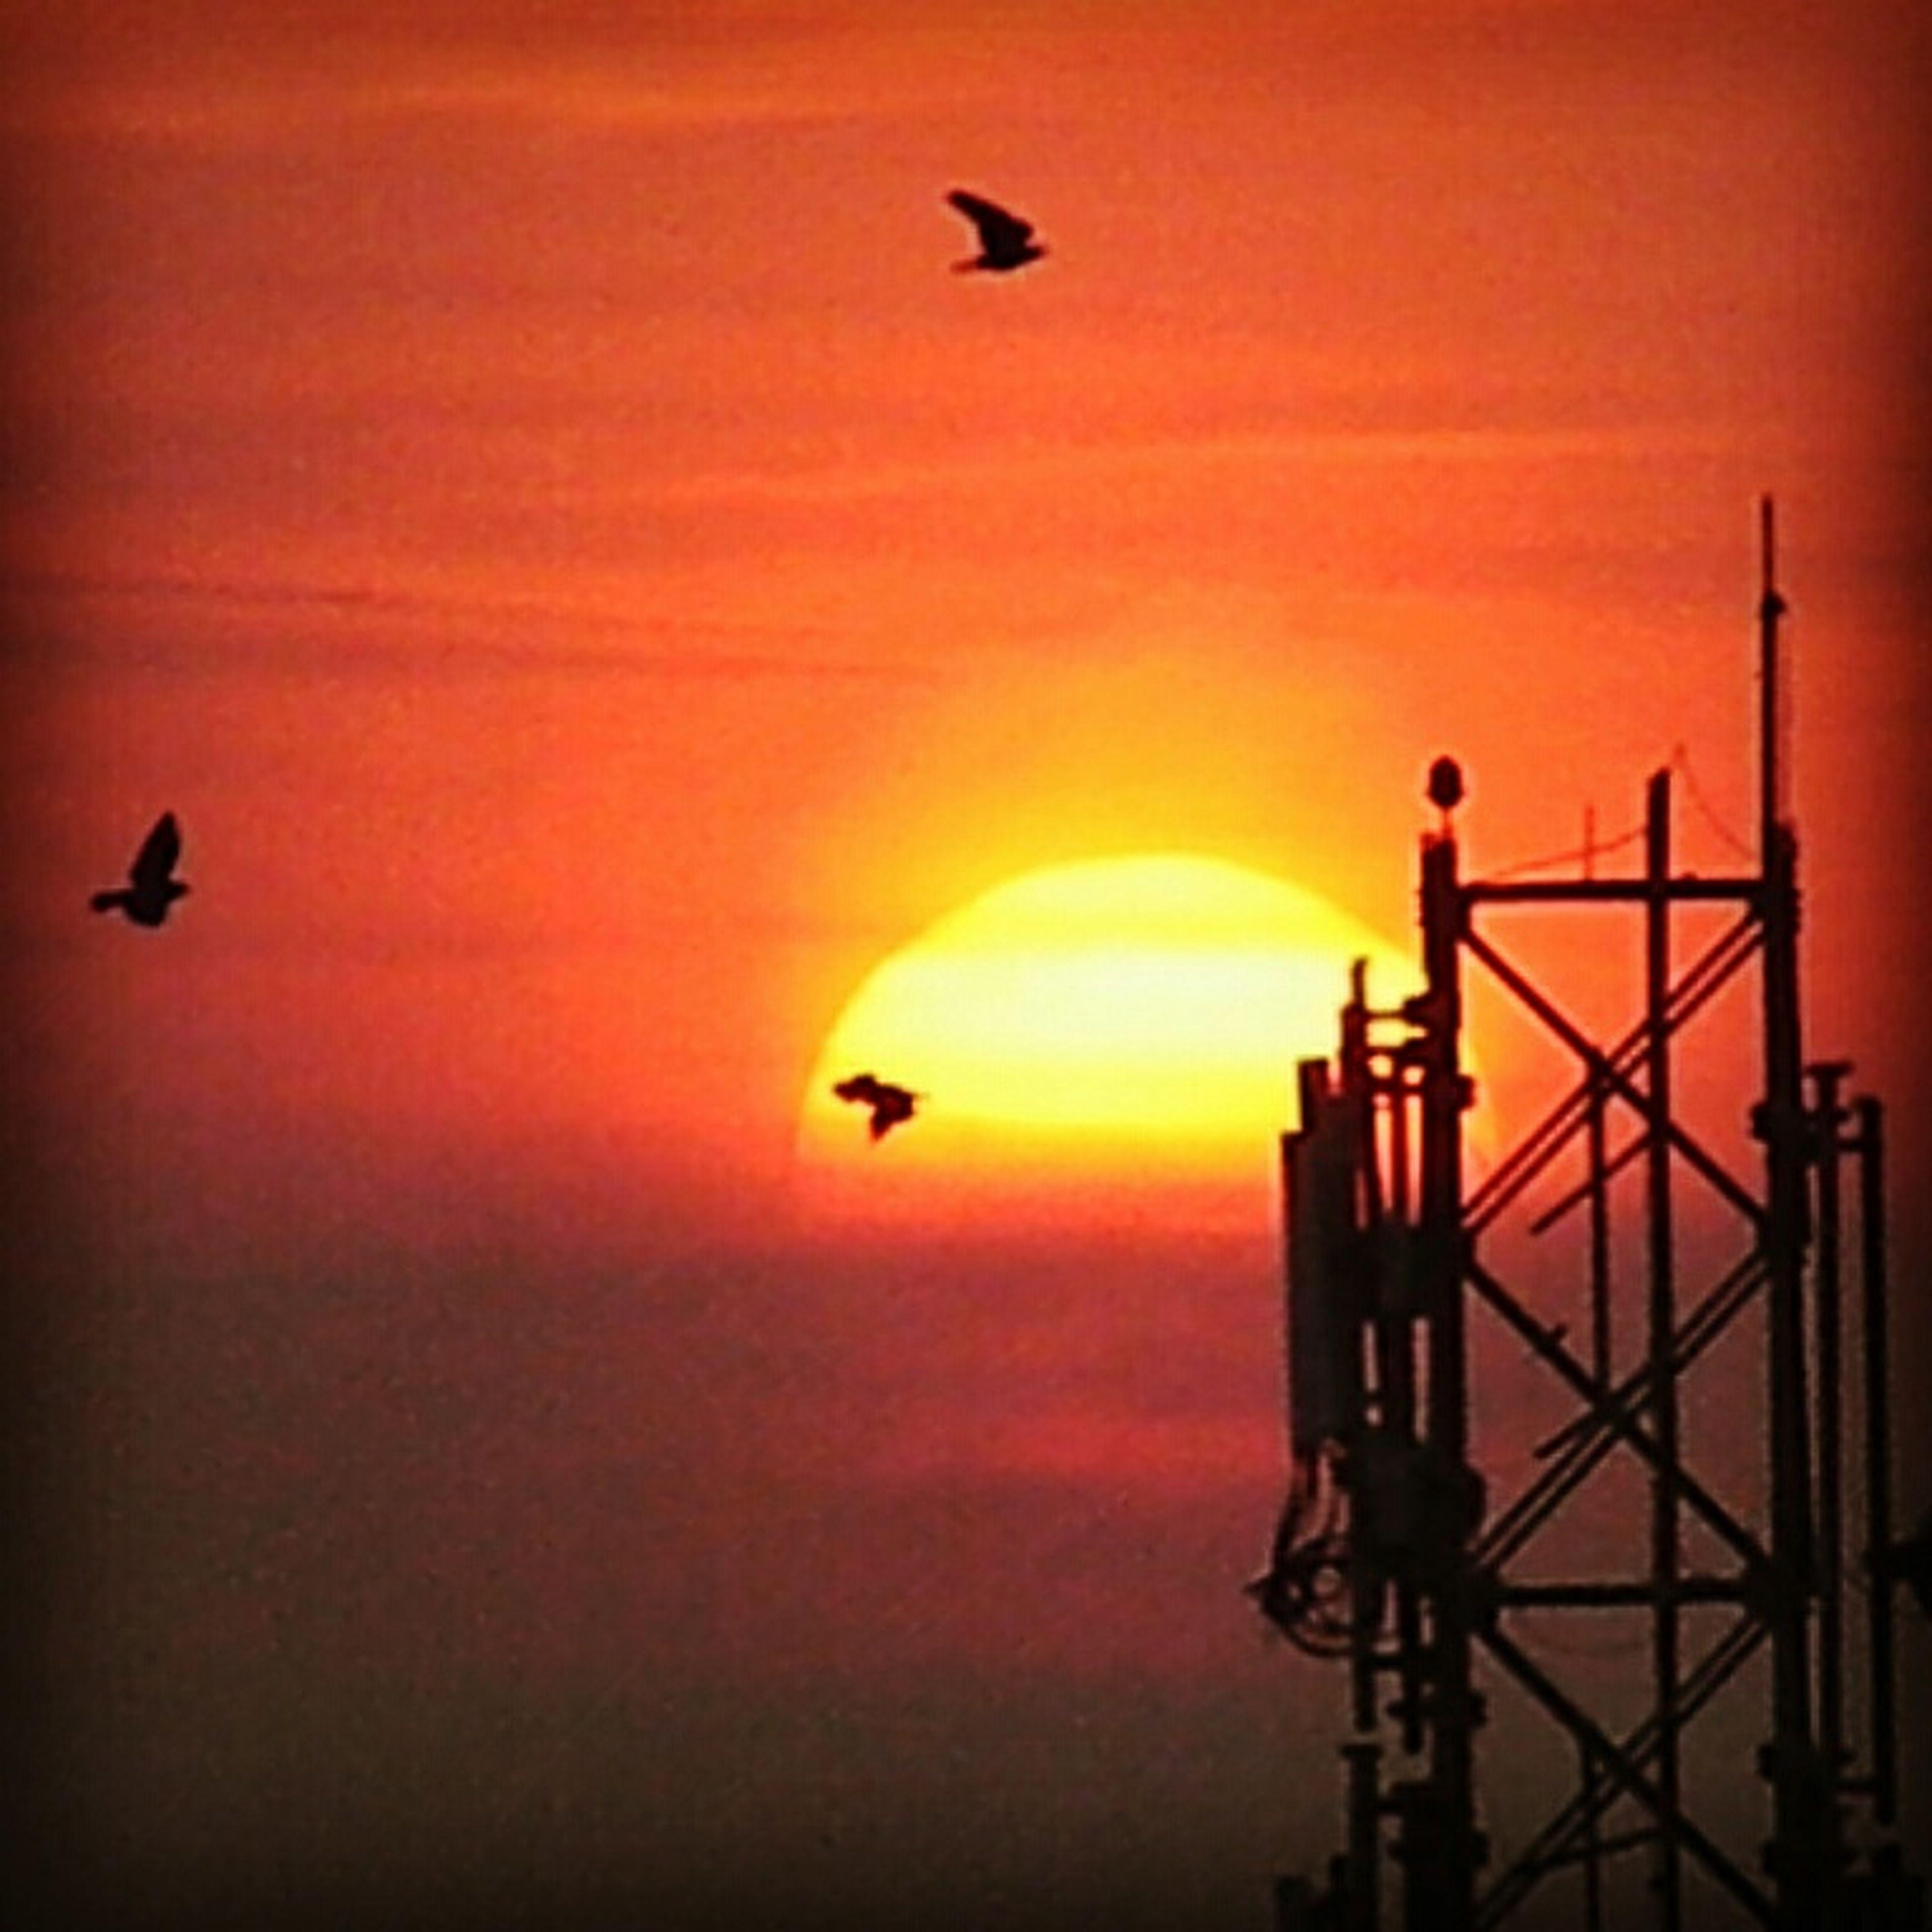 Early Morning Sunrise Birdy♥♥♥ Extra Zoom Lense Satisfaction